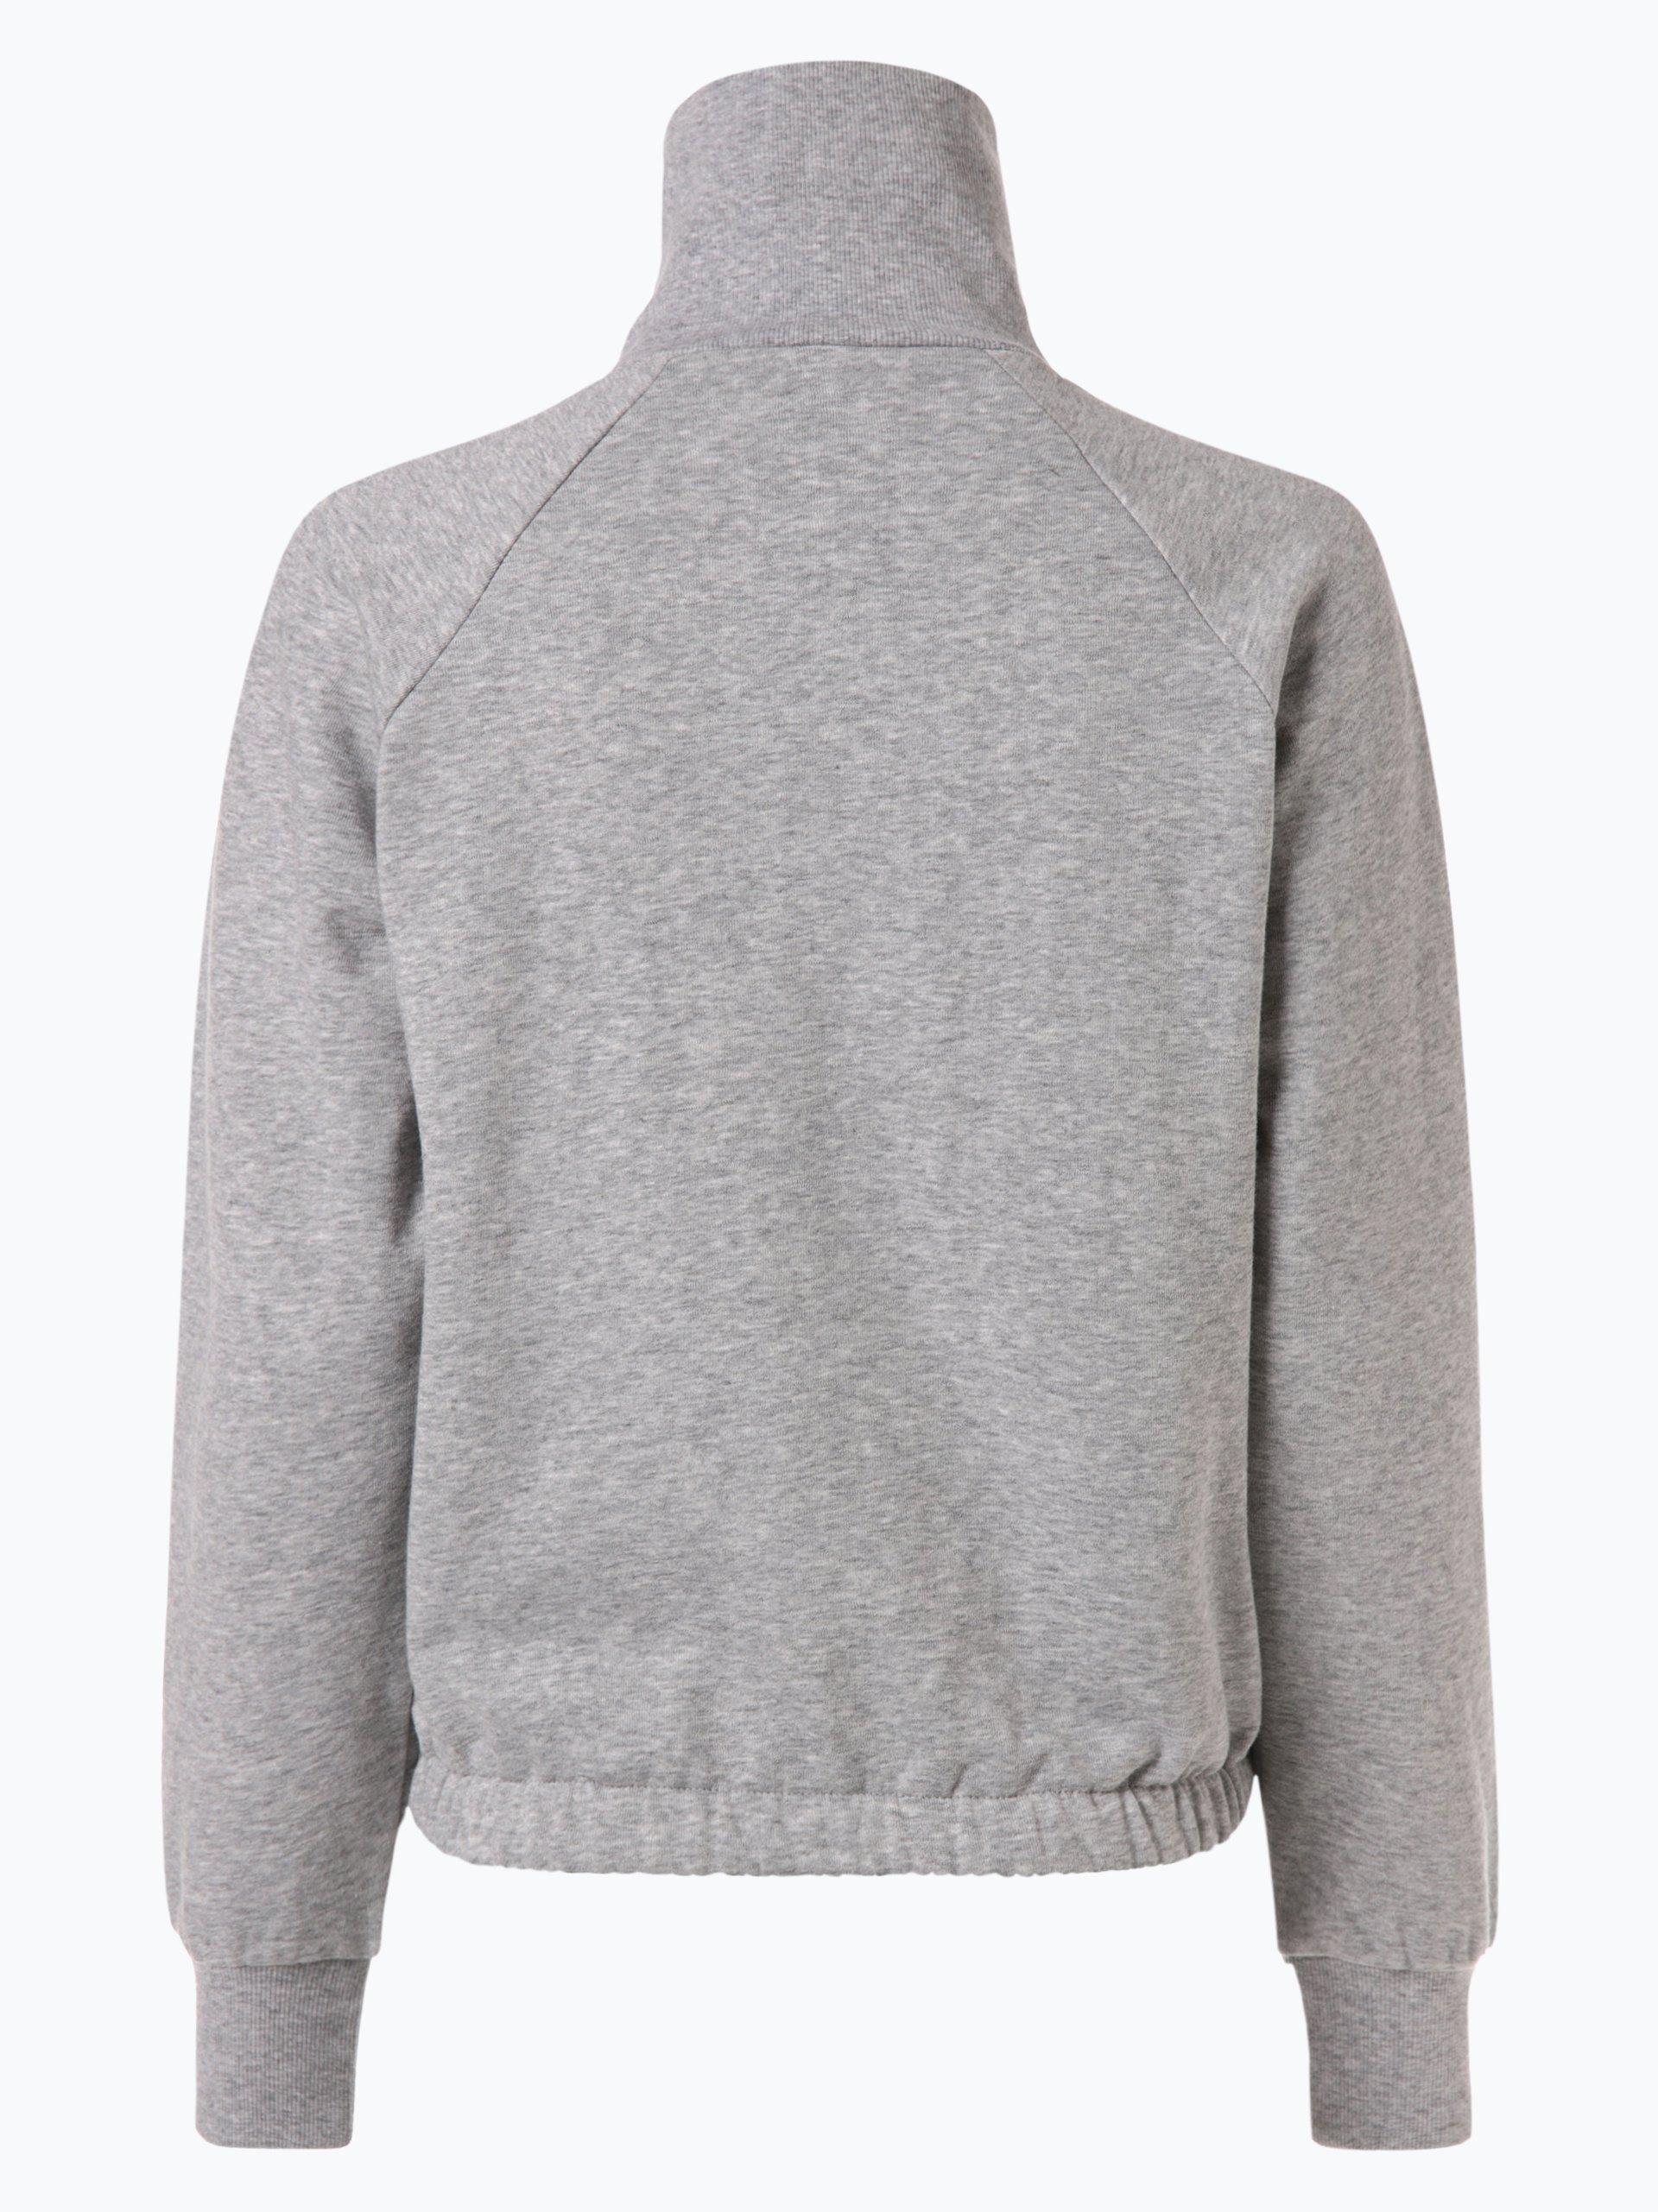 Juicy by Juicy Couture Damen Sweatshirt